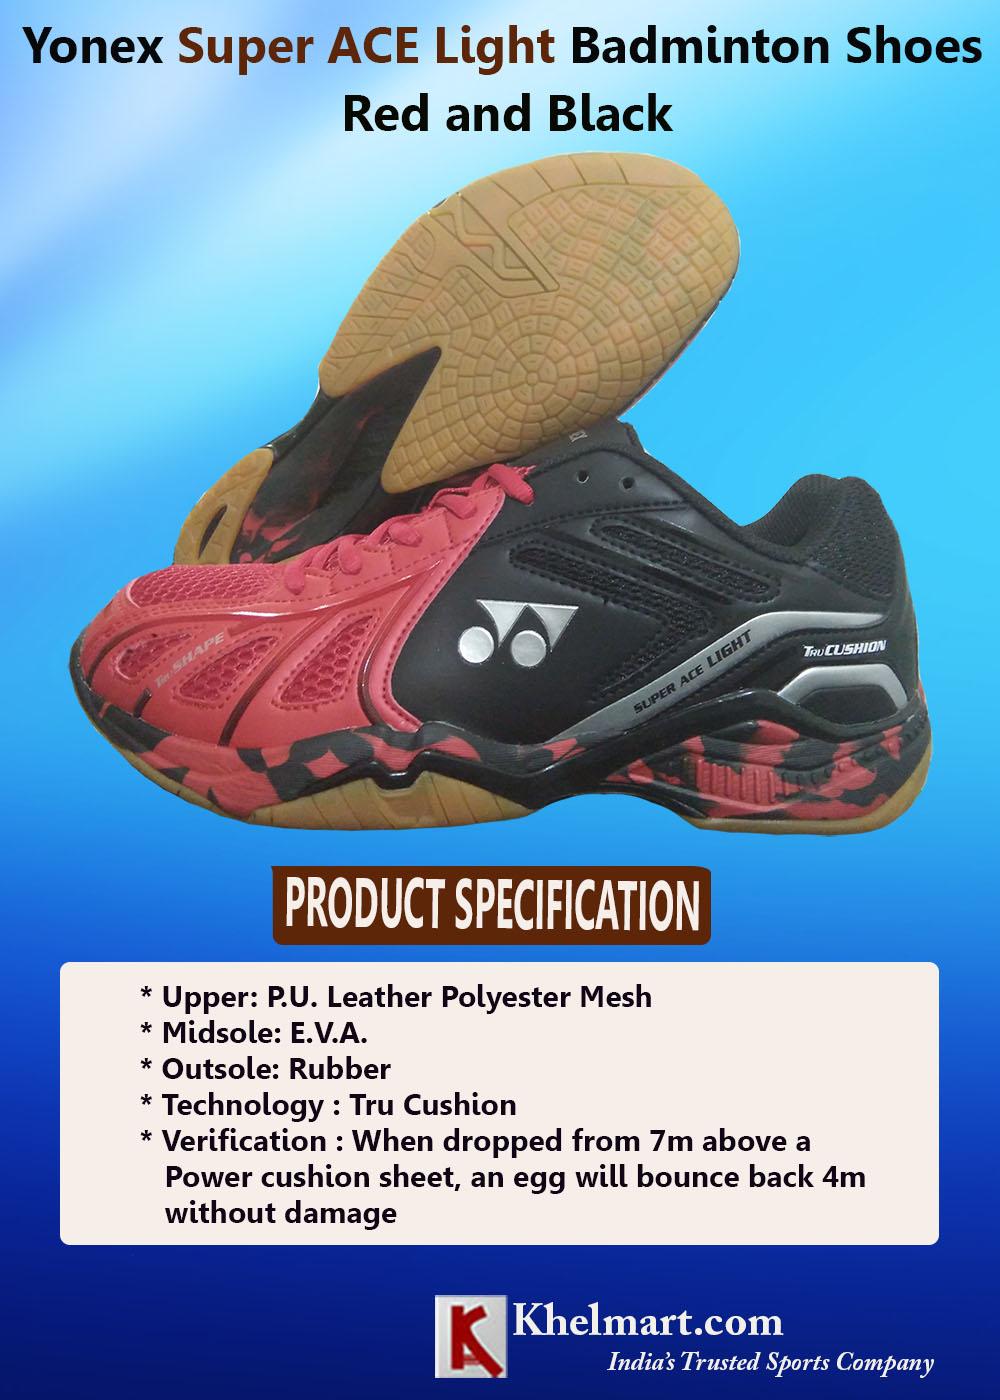 Yonex Super ACE Light Badminton Shoes Red and Black